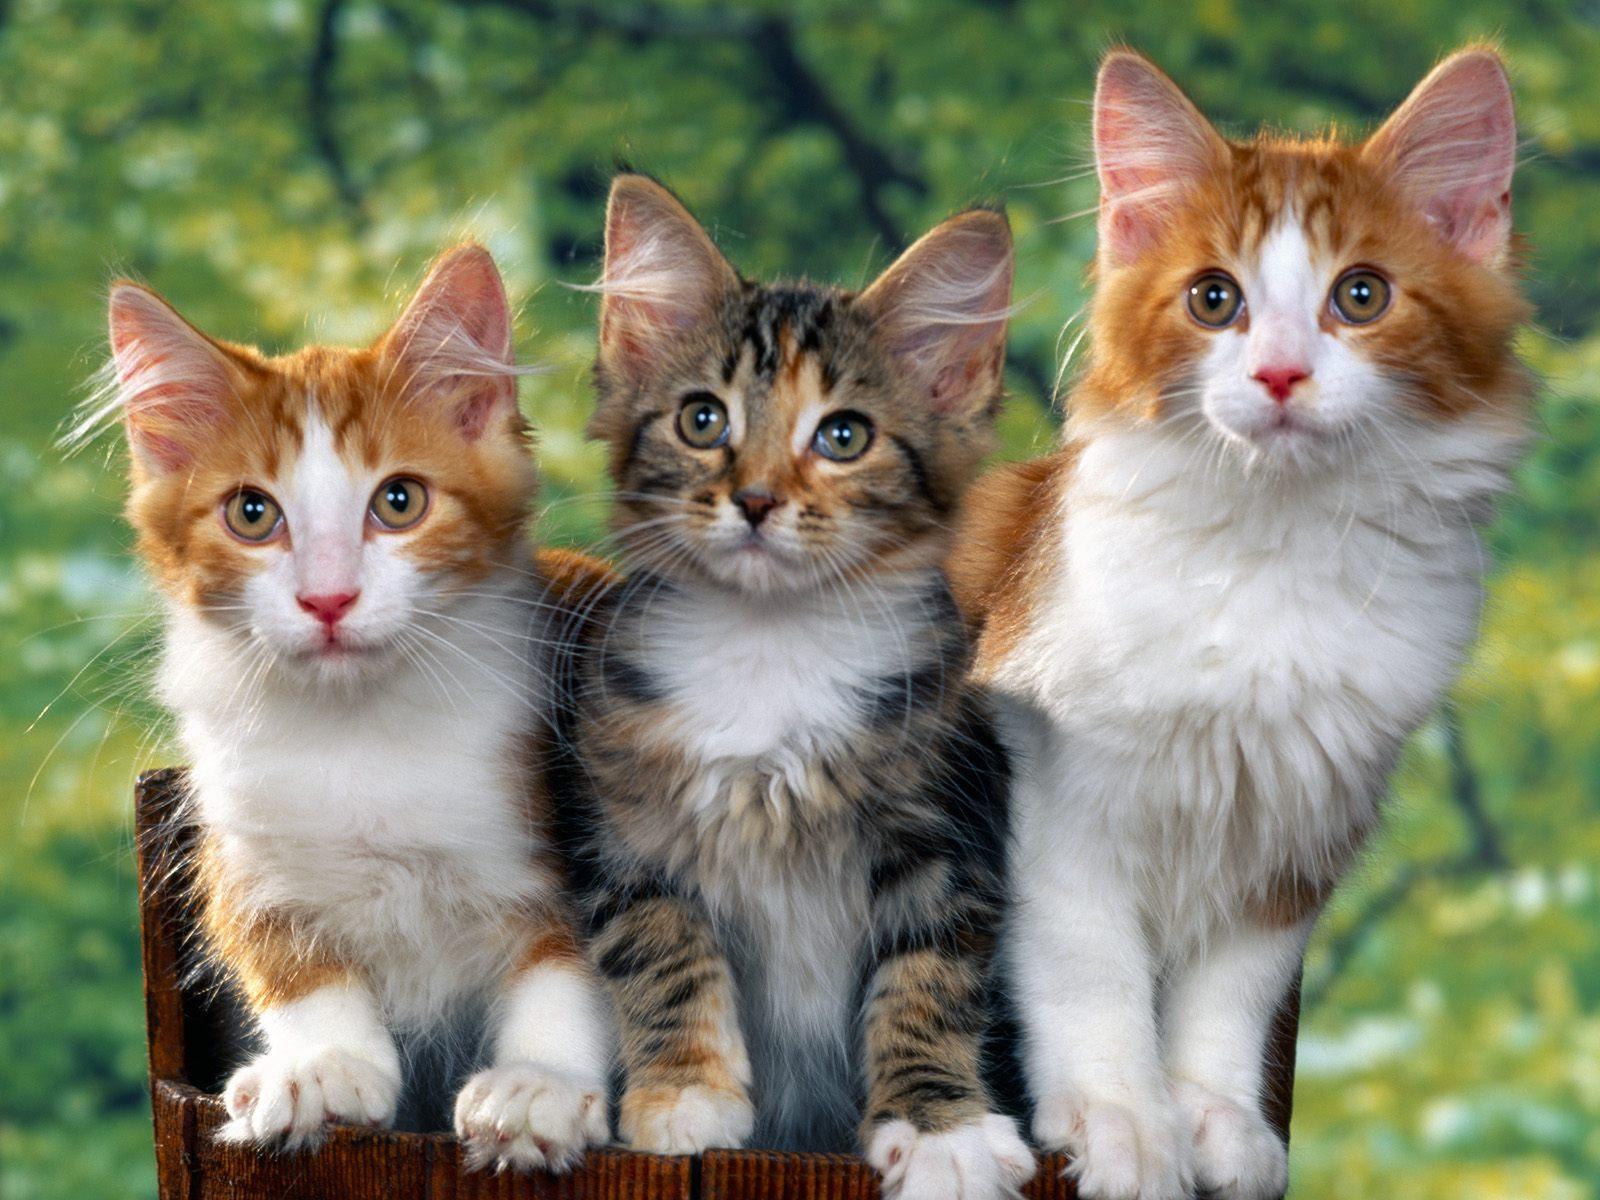 http://1.bp.blogspot.com/_jJu6heRzjEA/TKQ8I3wrbEI/AAAAAAAAAwo/7MB9K7FzBBw/s1600/wallpaper+kucing.jpg